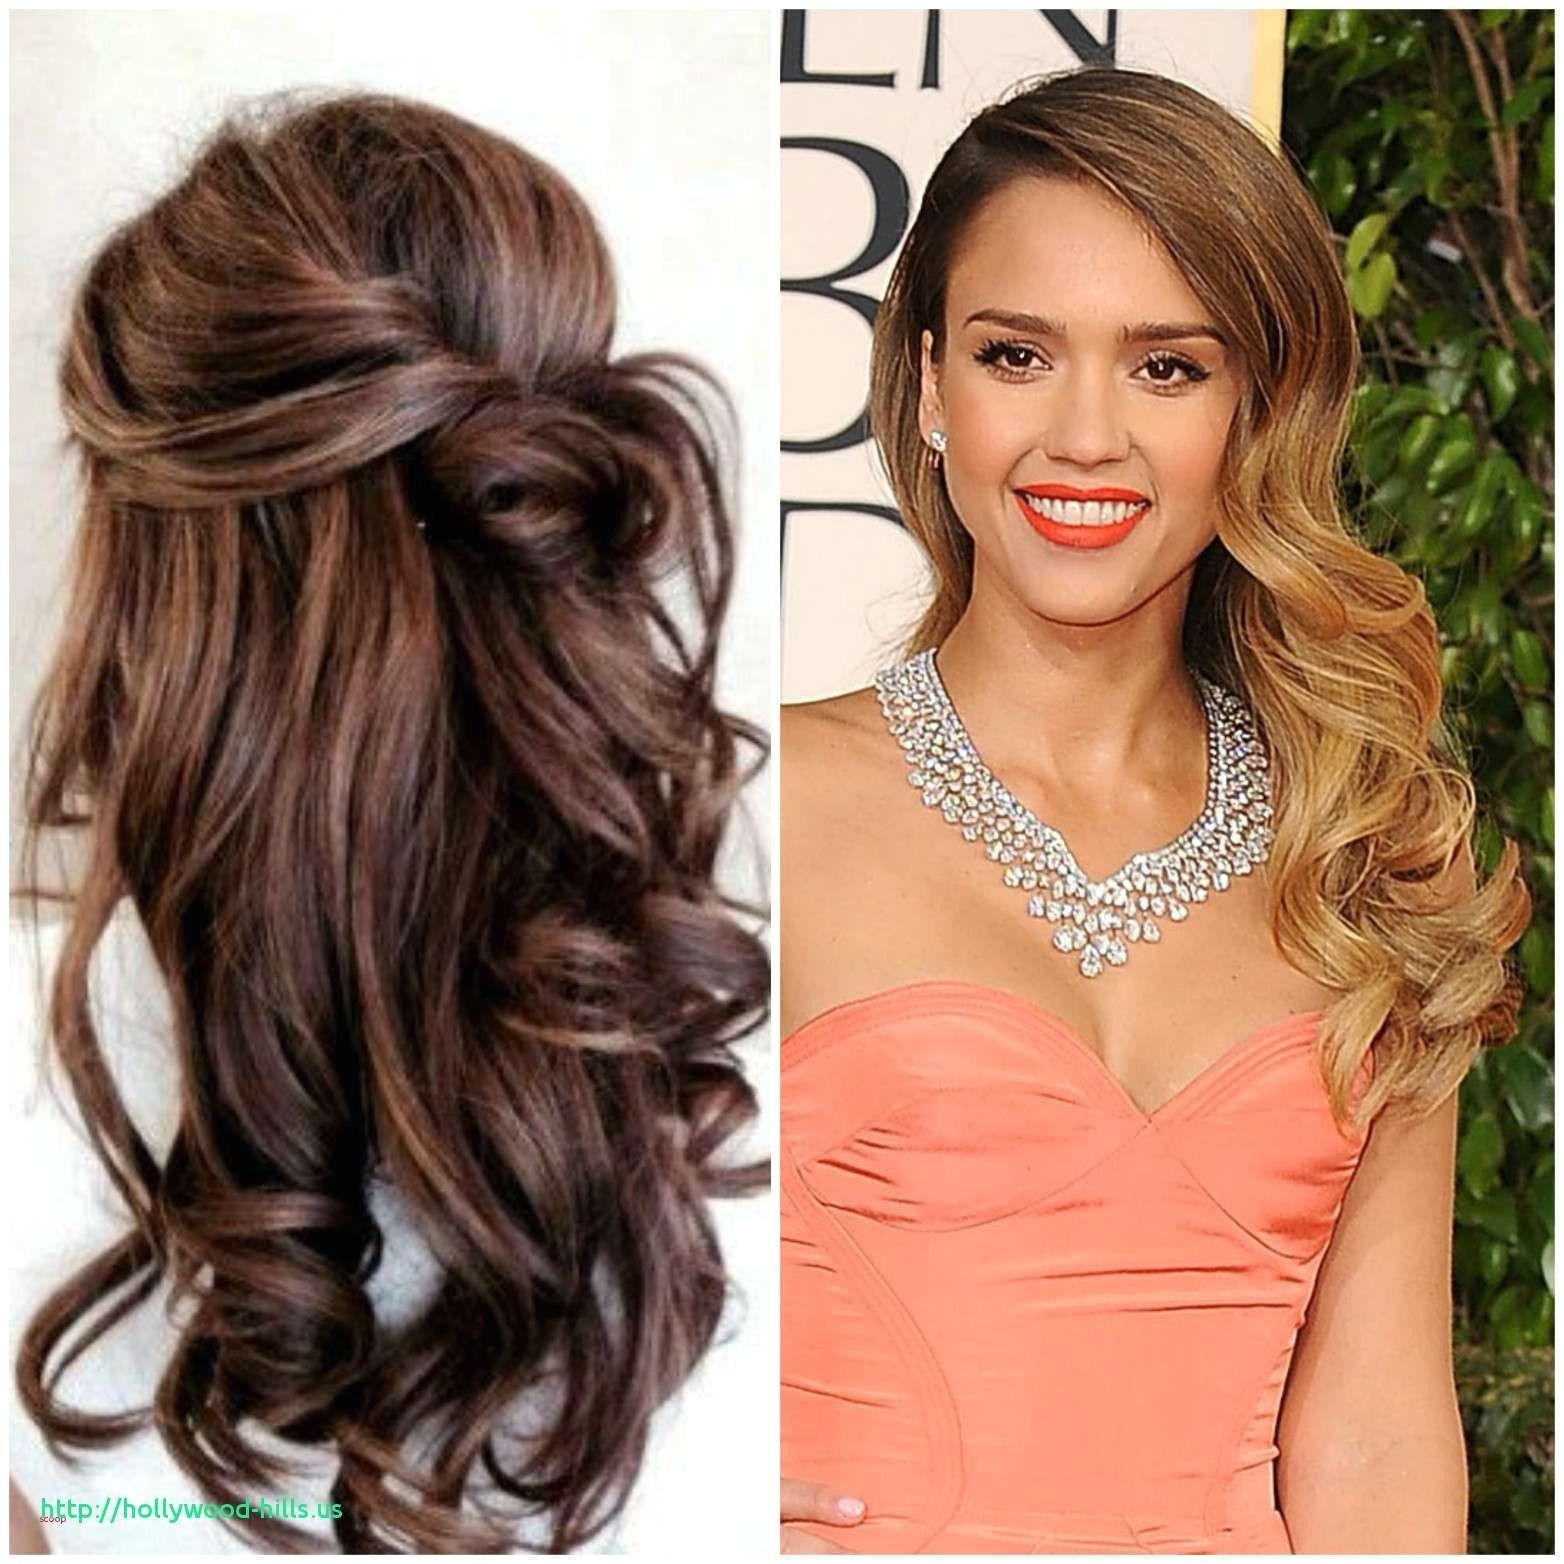 Hair Coloring Inspirational Using Amusing Inspirational Hairstyles For Long Hair 2015 Luxury I Pinimg 1200x 0d Fresh Short Hair Wedding